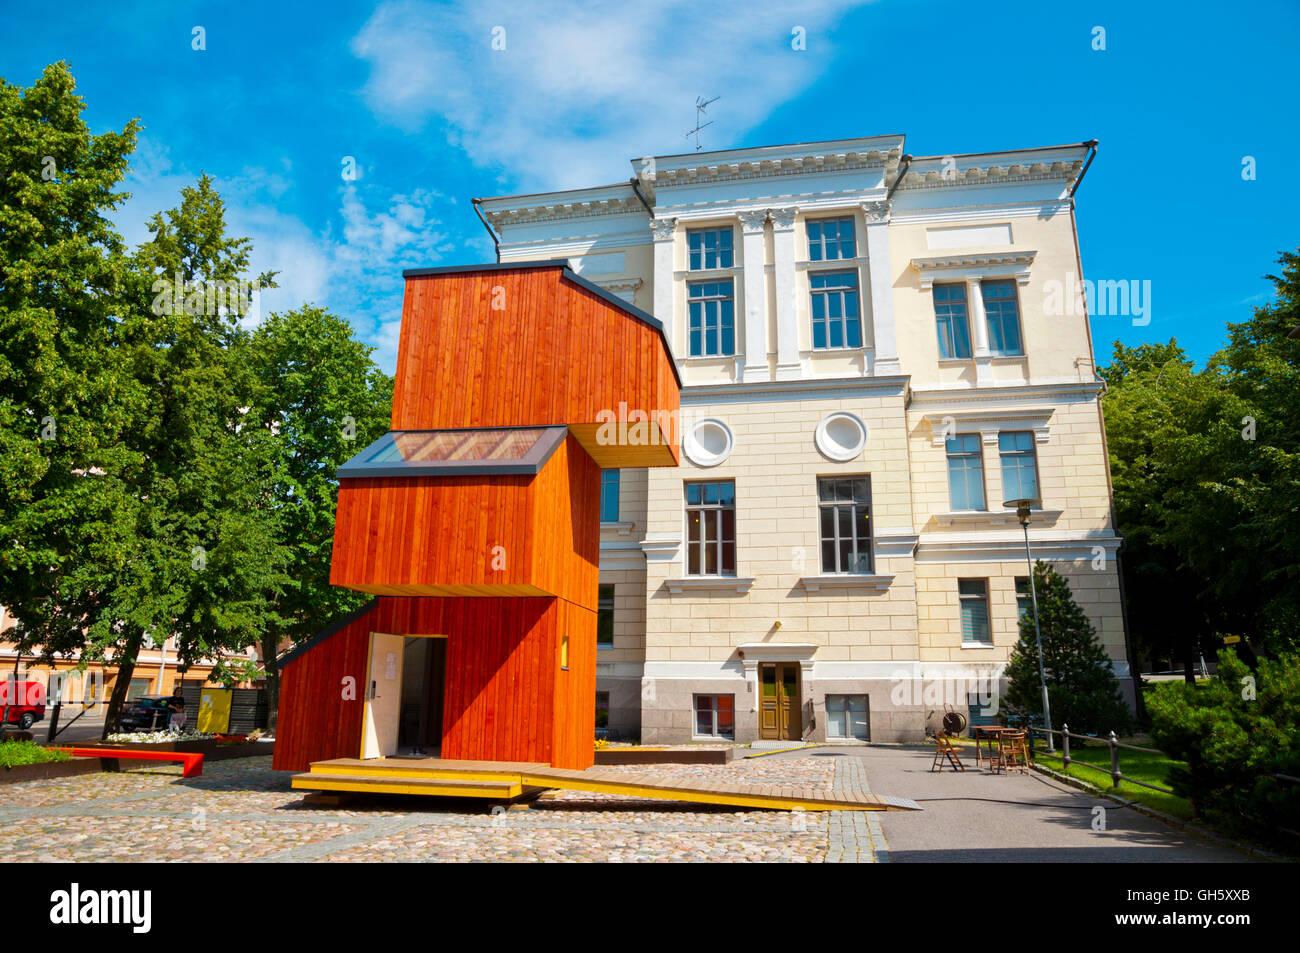 Suomen arkkitehtuurimuseo, Musée de l'architecture finlandaise, avec sol en bois KoKoon, Helsinki, Finlande Photo Stock